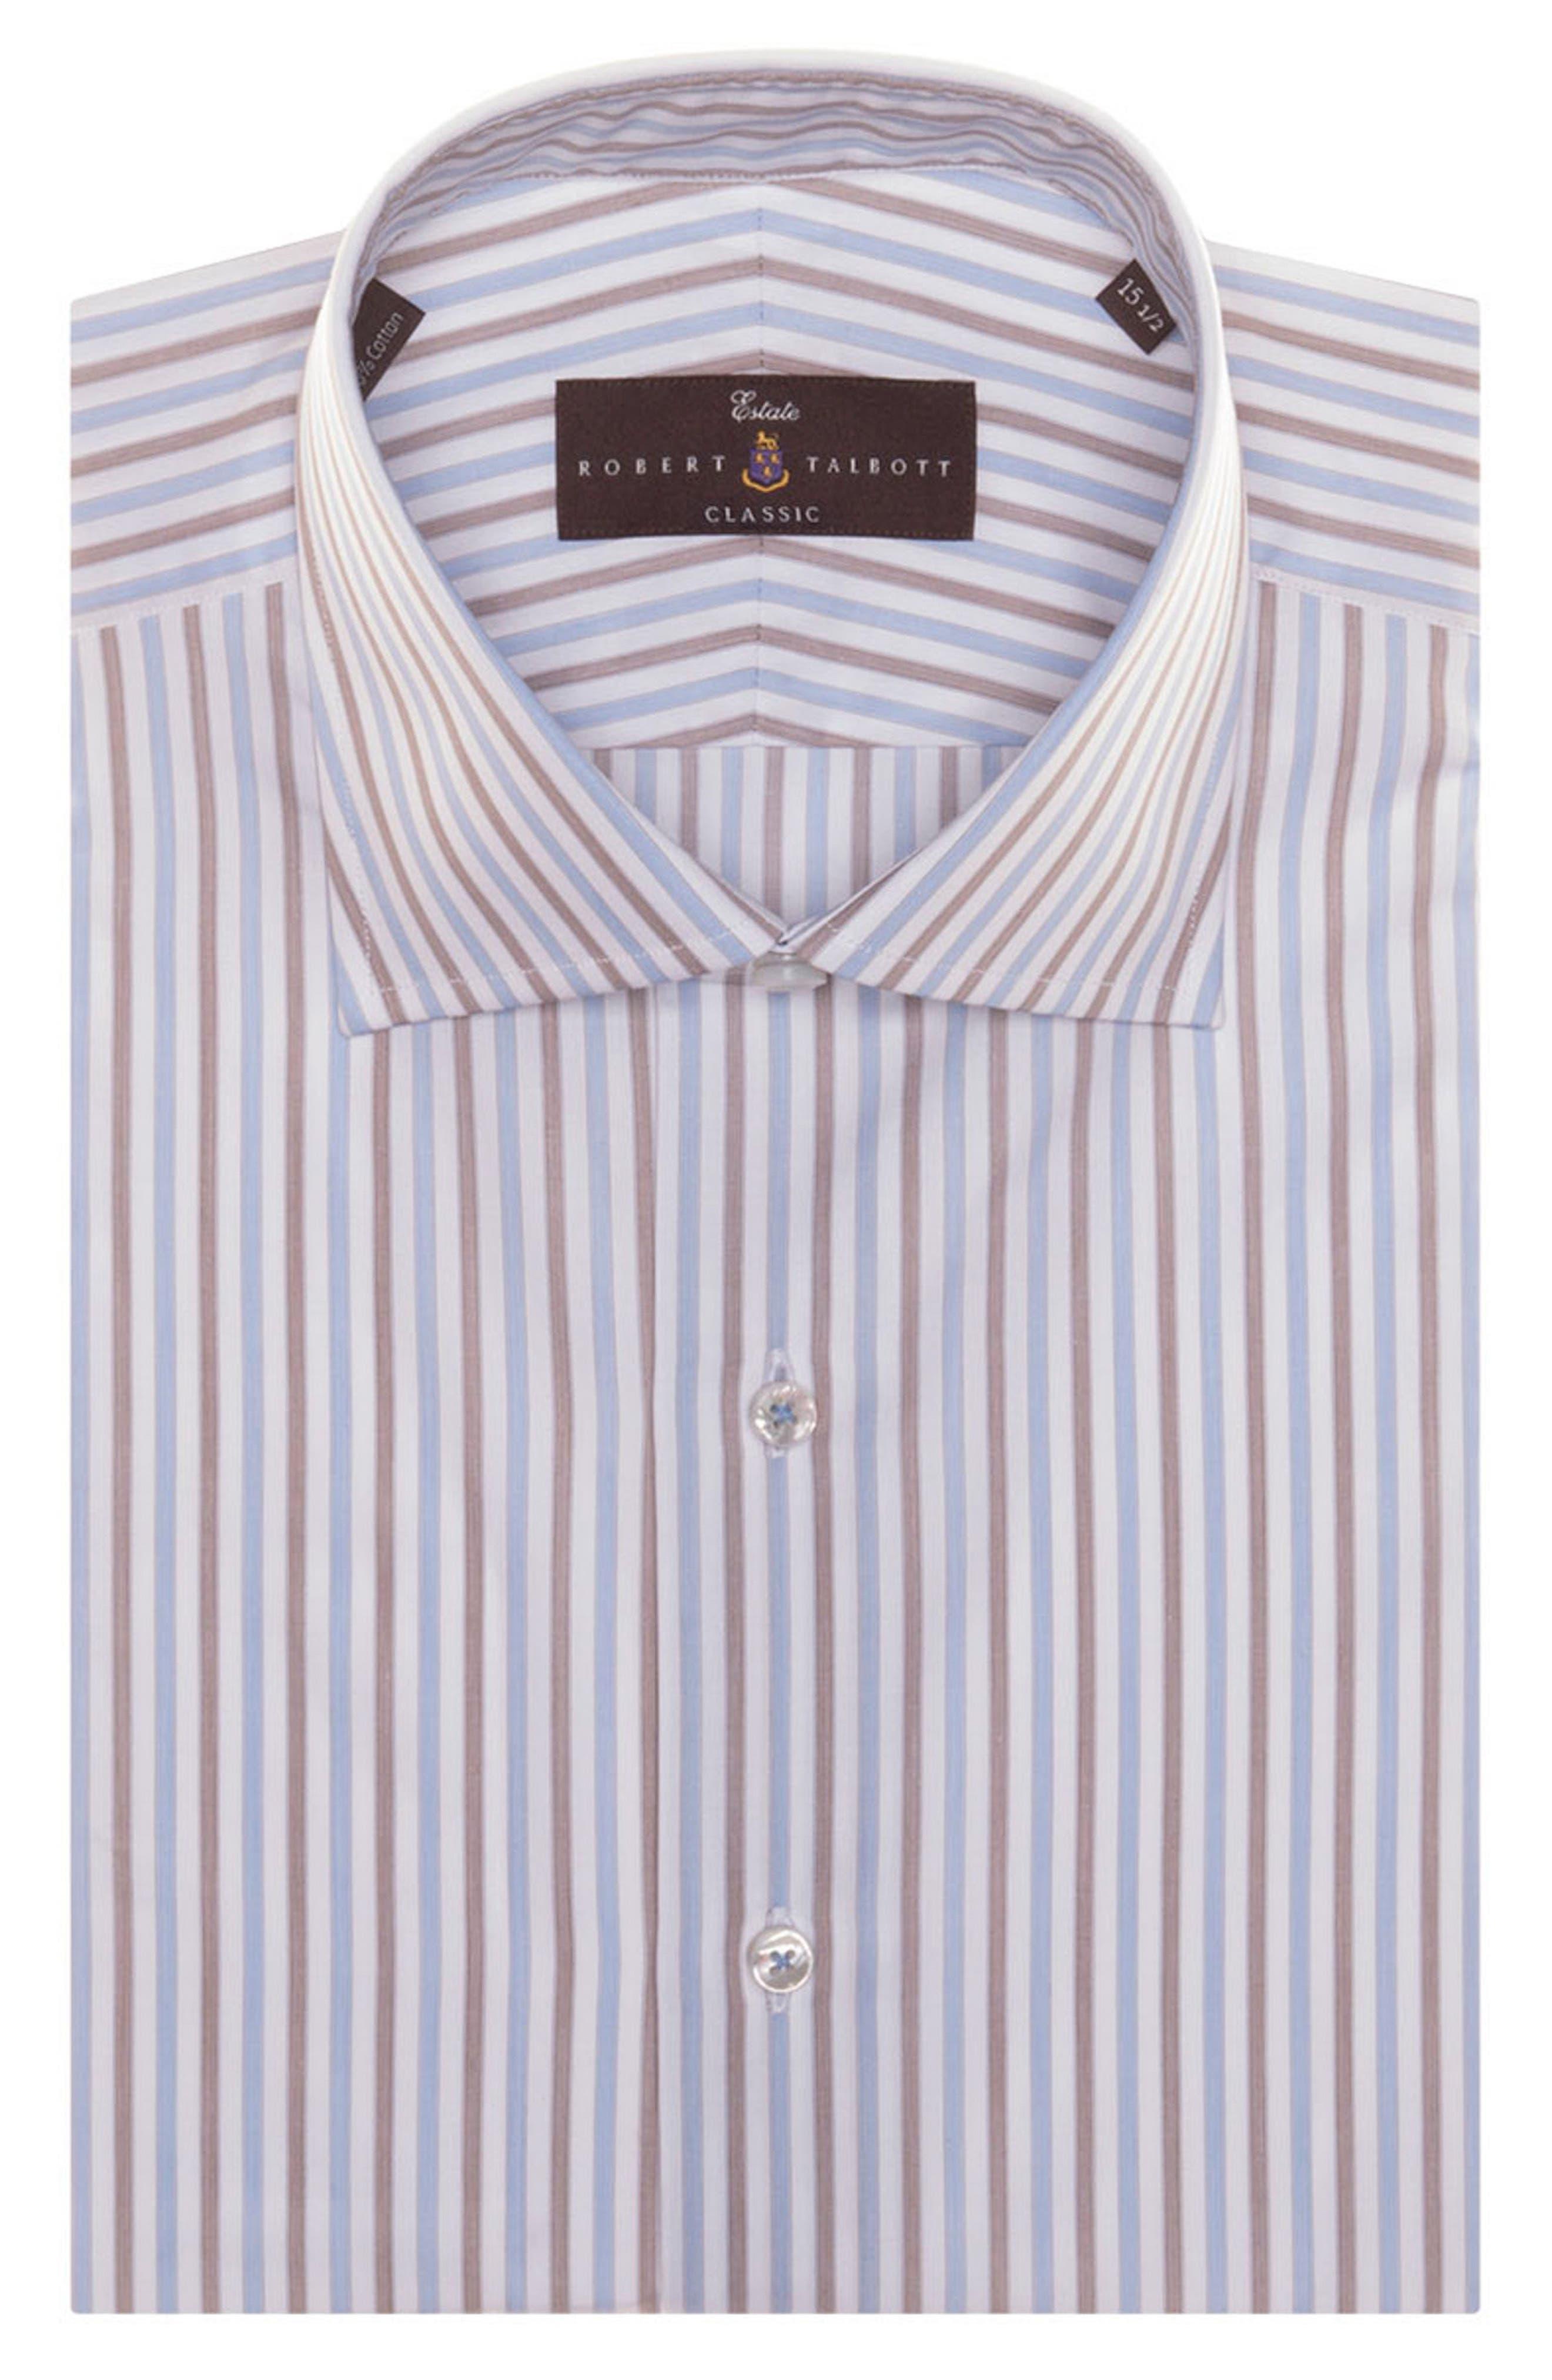 Tailored Fit Stripe Dress Shirt,                             Main thumbnail 1, color,                             200